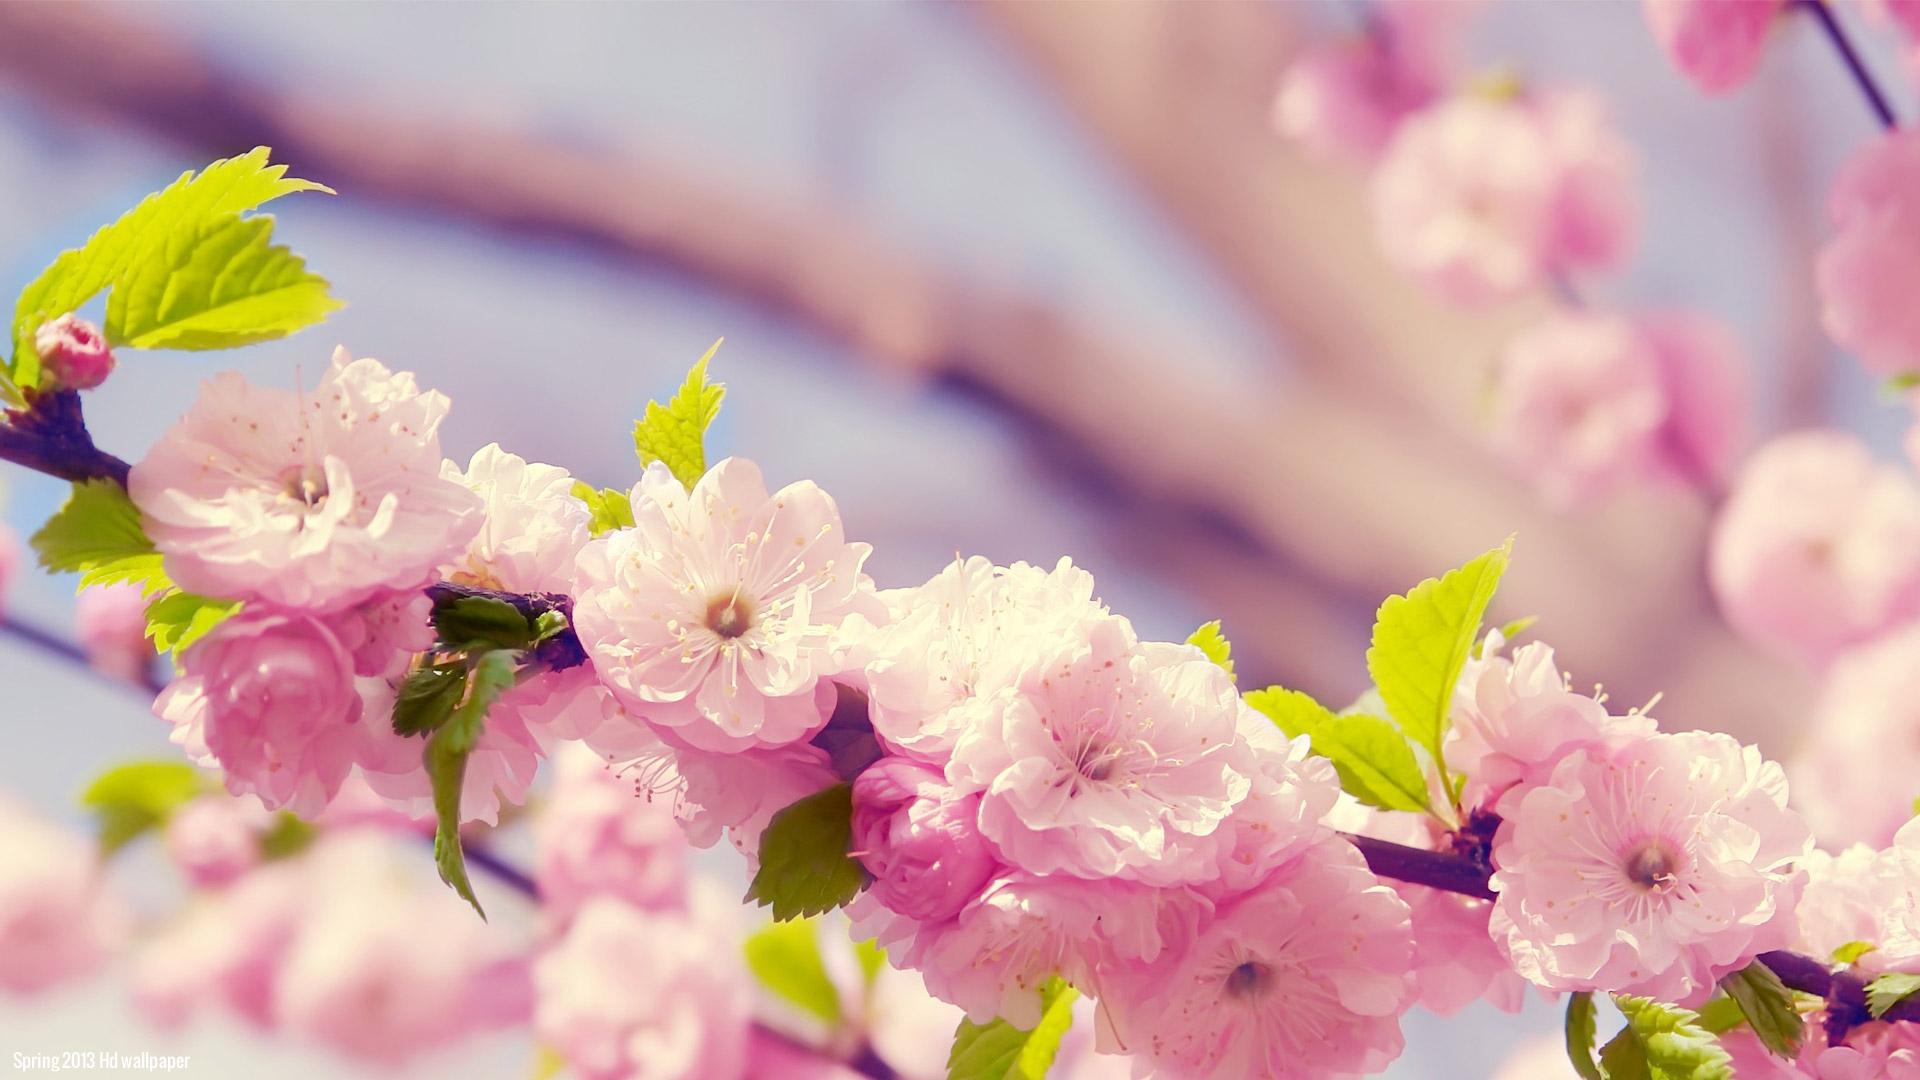 Spring Flower Wallpapers wallpaper Spring Flower Wallpapers hd 1920x1080